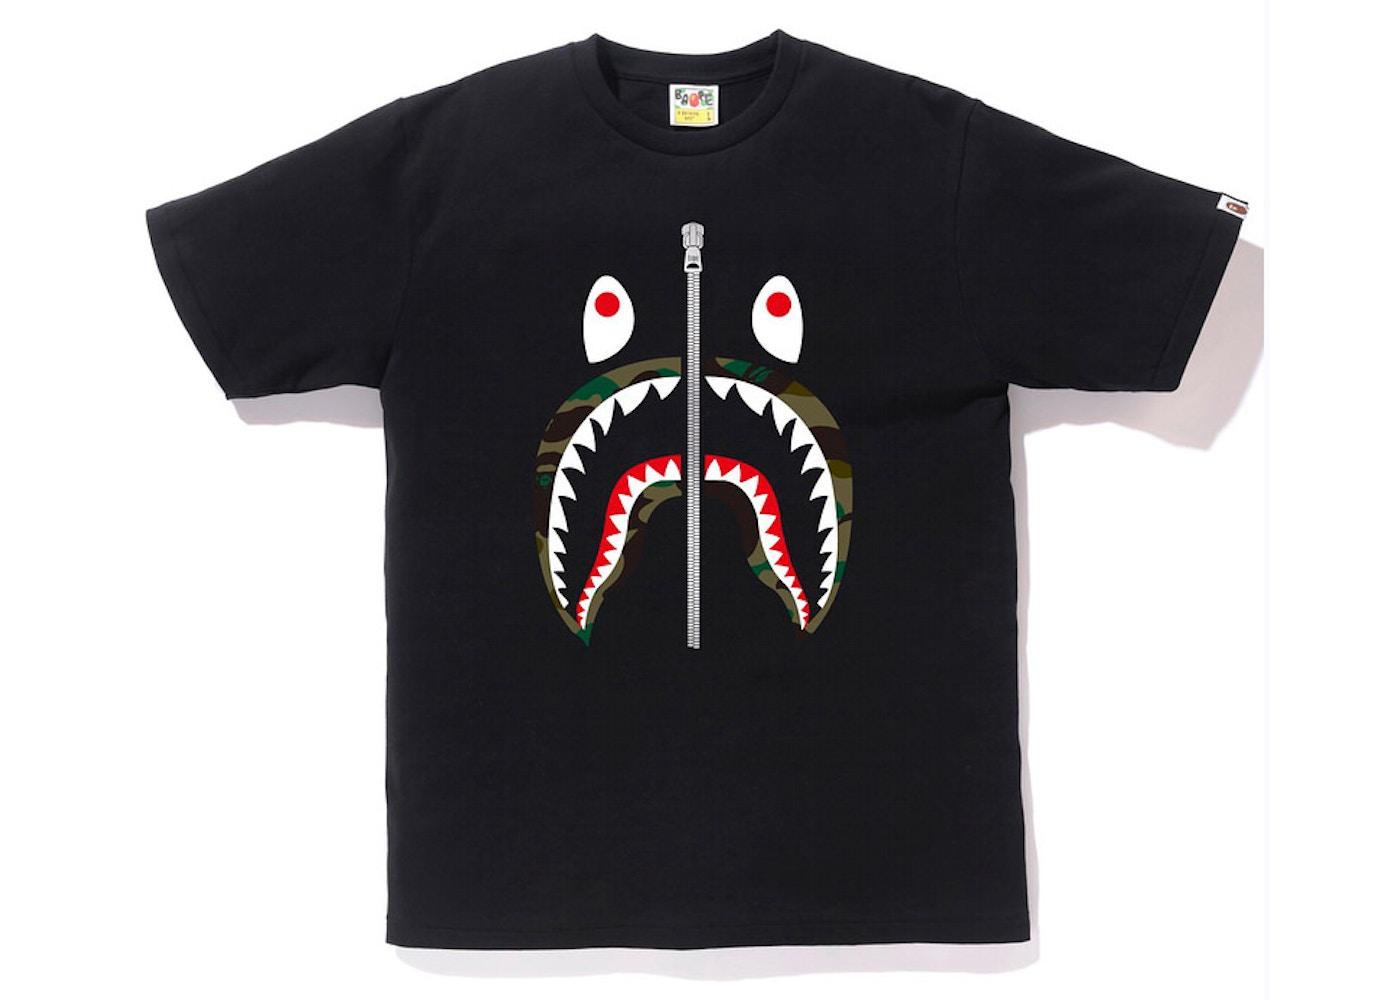 c2bd5acc BAPE 1st Camo Shark Tee Tee Black/Green - SS18